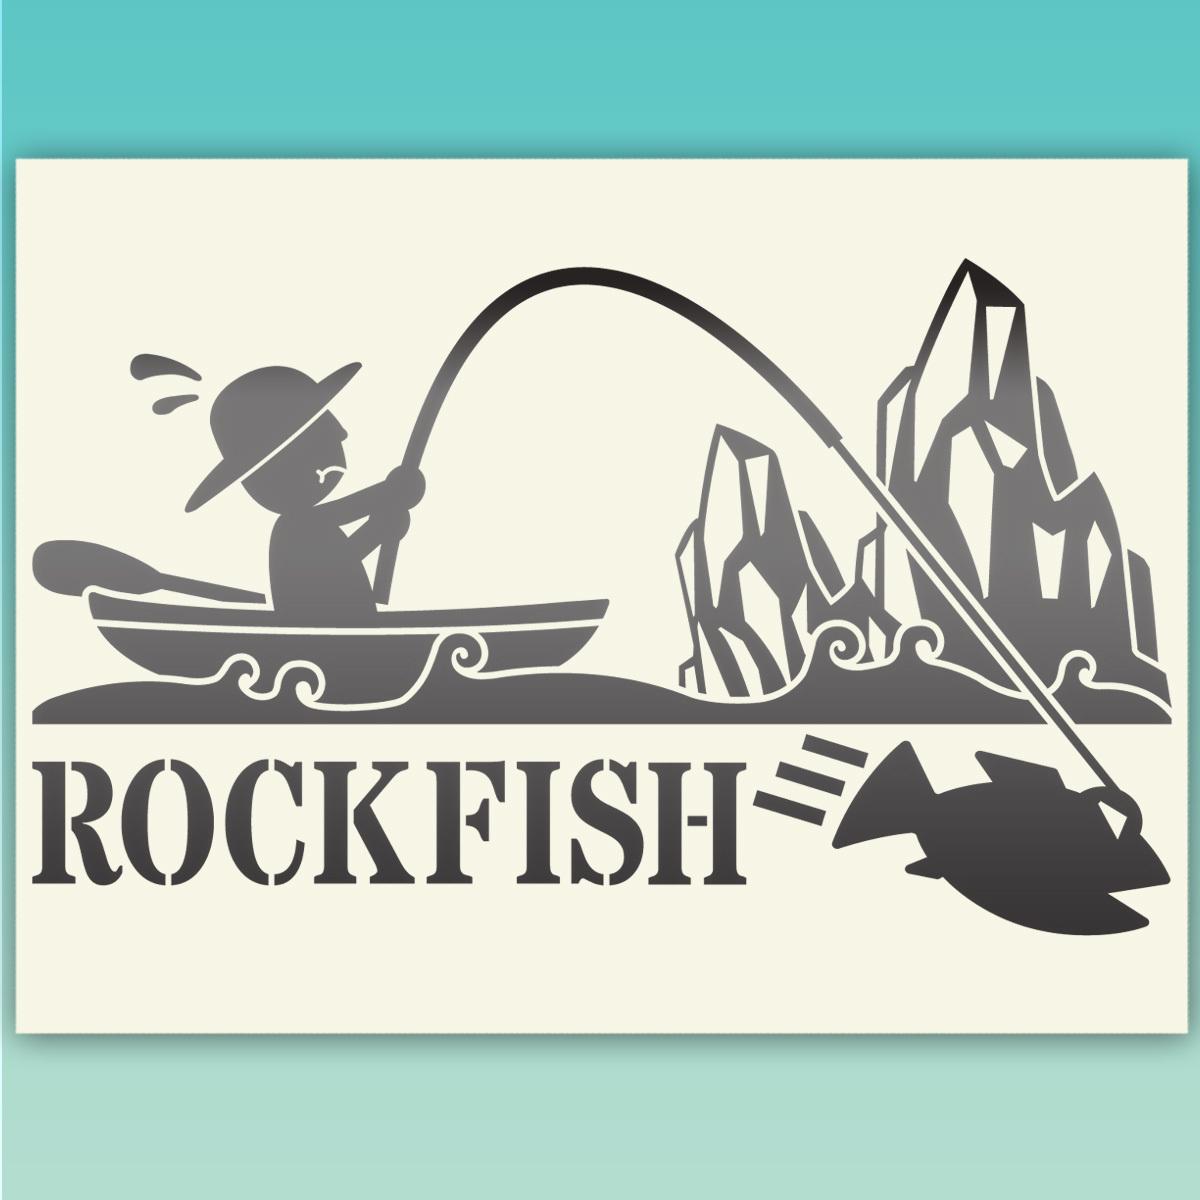 ●ROCKFISH ロックフィッシュ 釣り フィッシングステッカー  517 金色または銀色_画像2